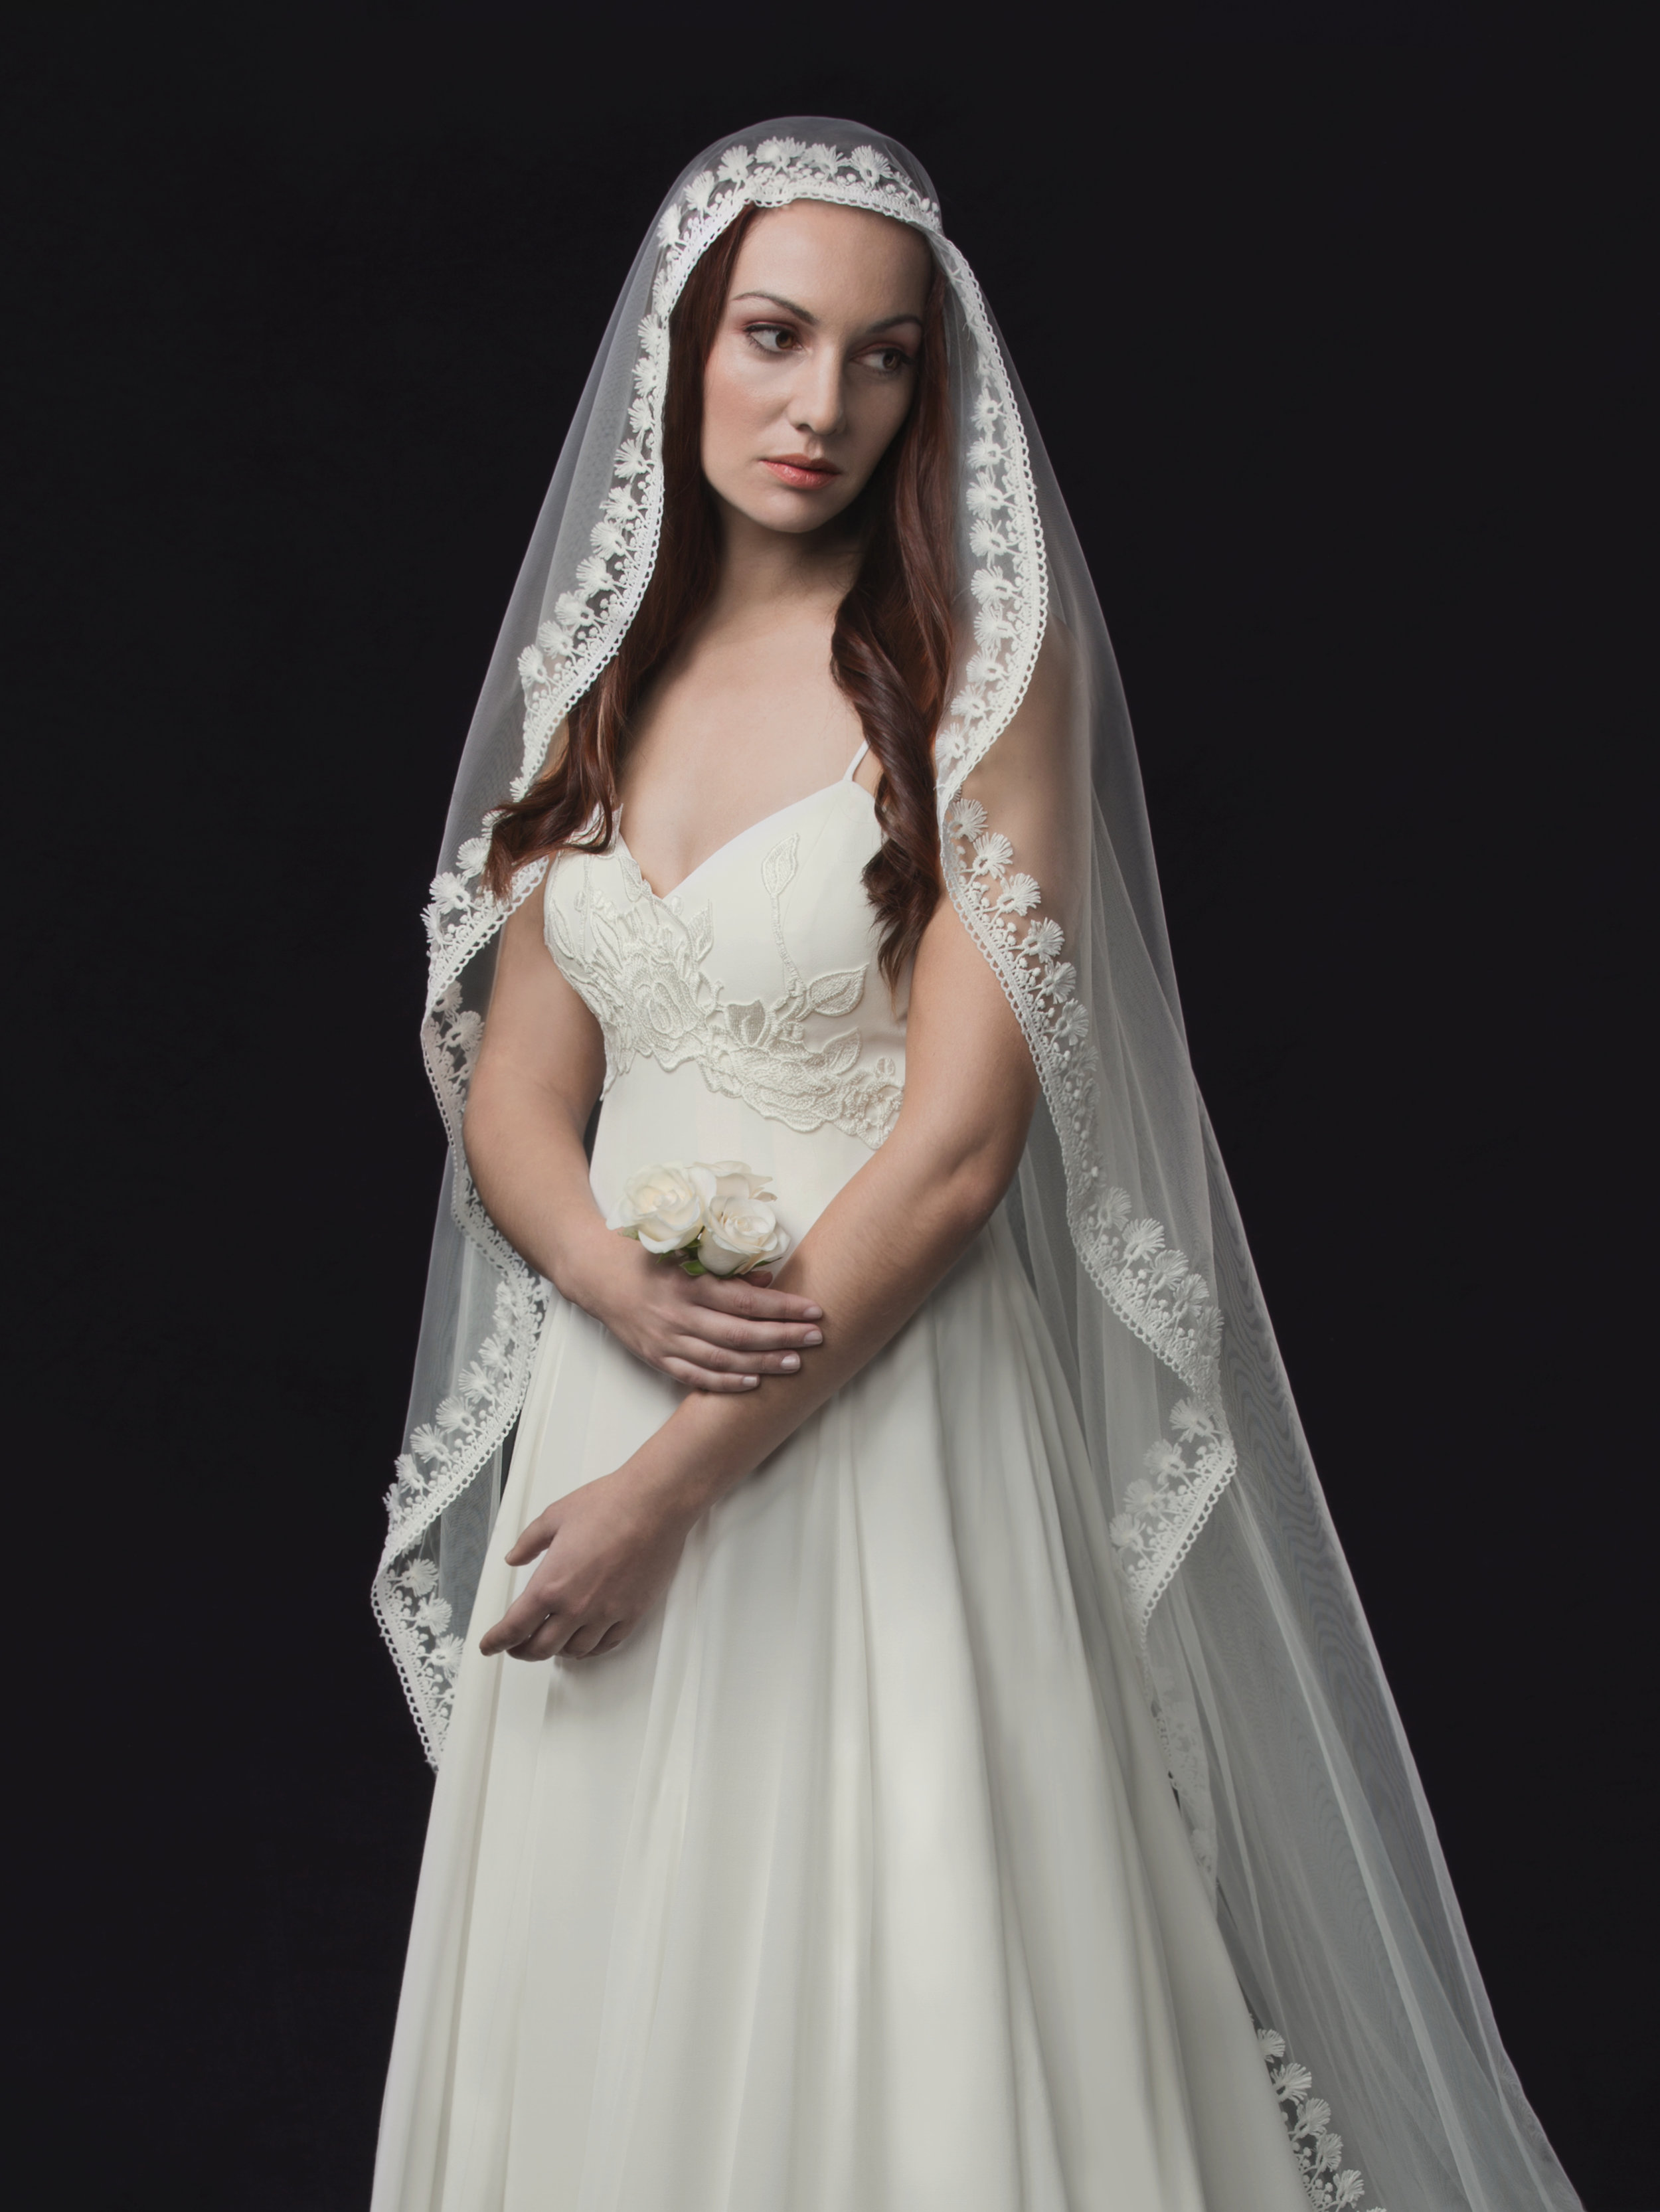 Fieulaine-Sam-Fine-Art-Bridal_Farryn-04-5.jpg